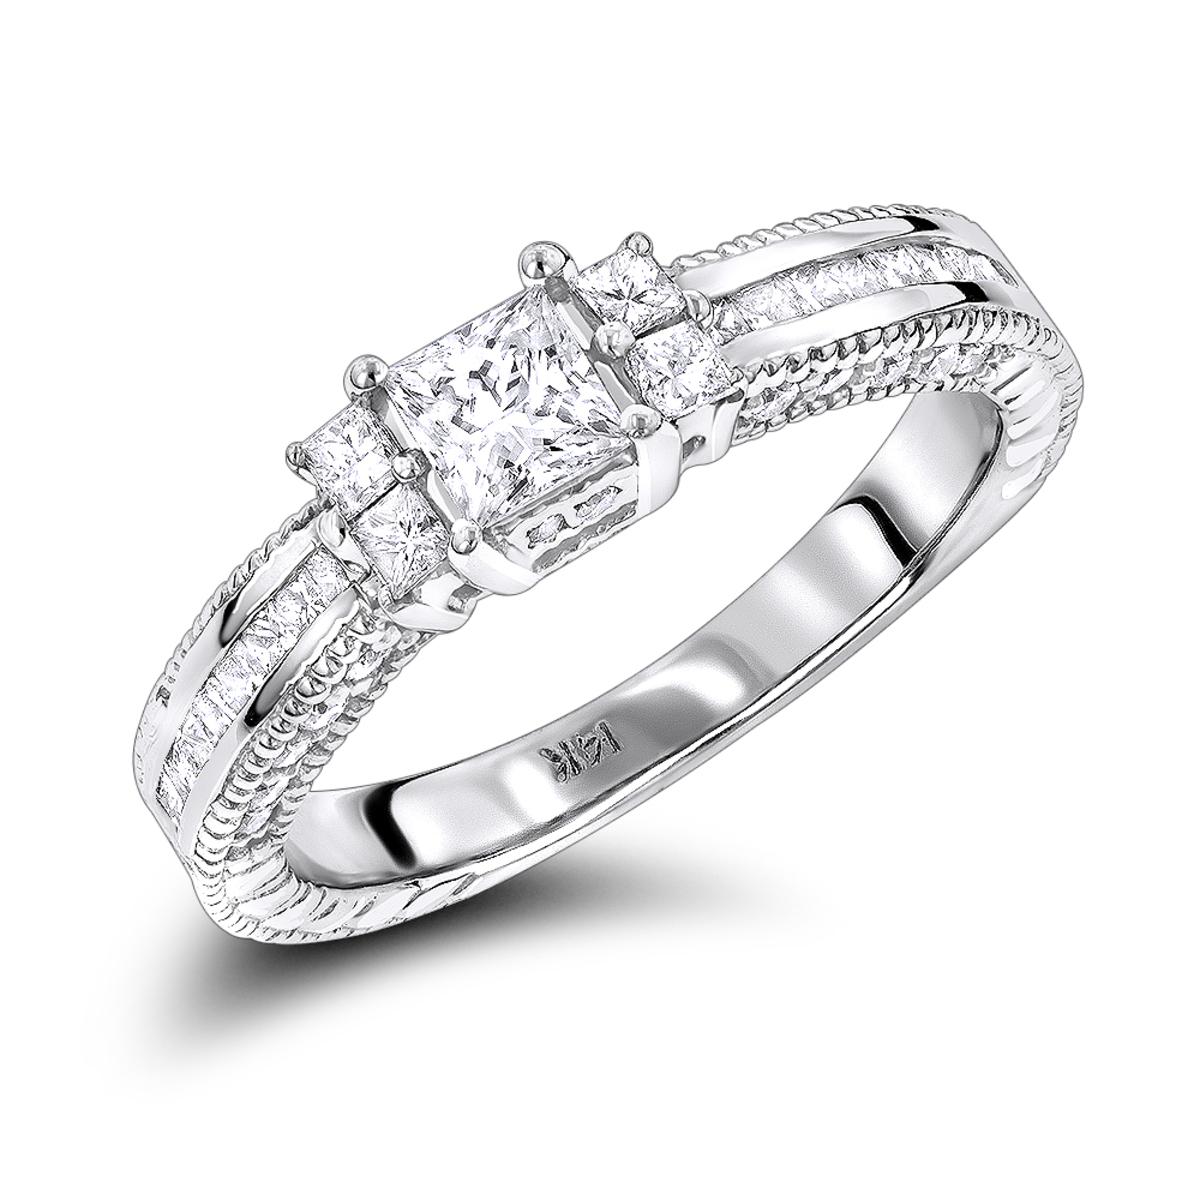 14K Gold Diamond Unique Engagement Ring 1.24ct